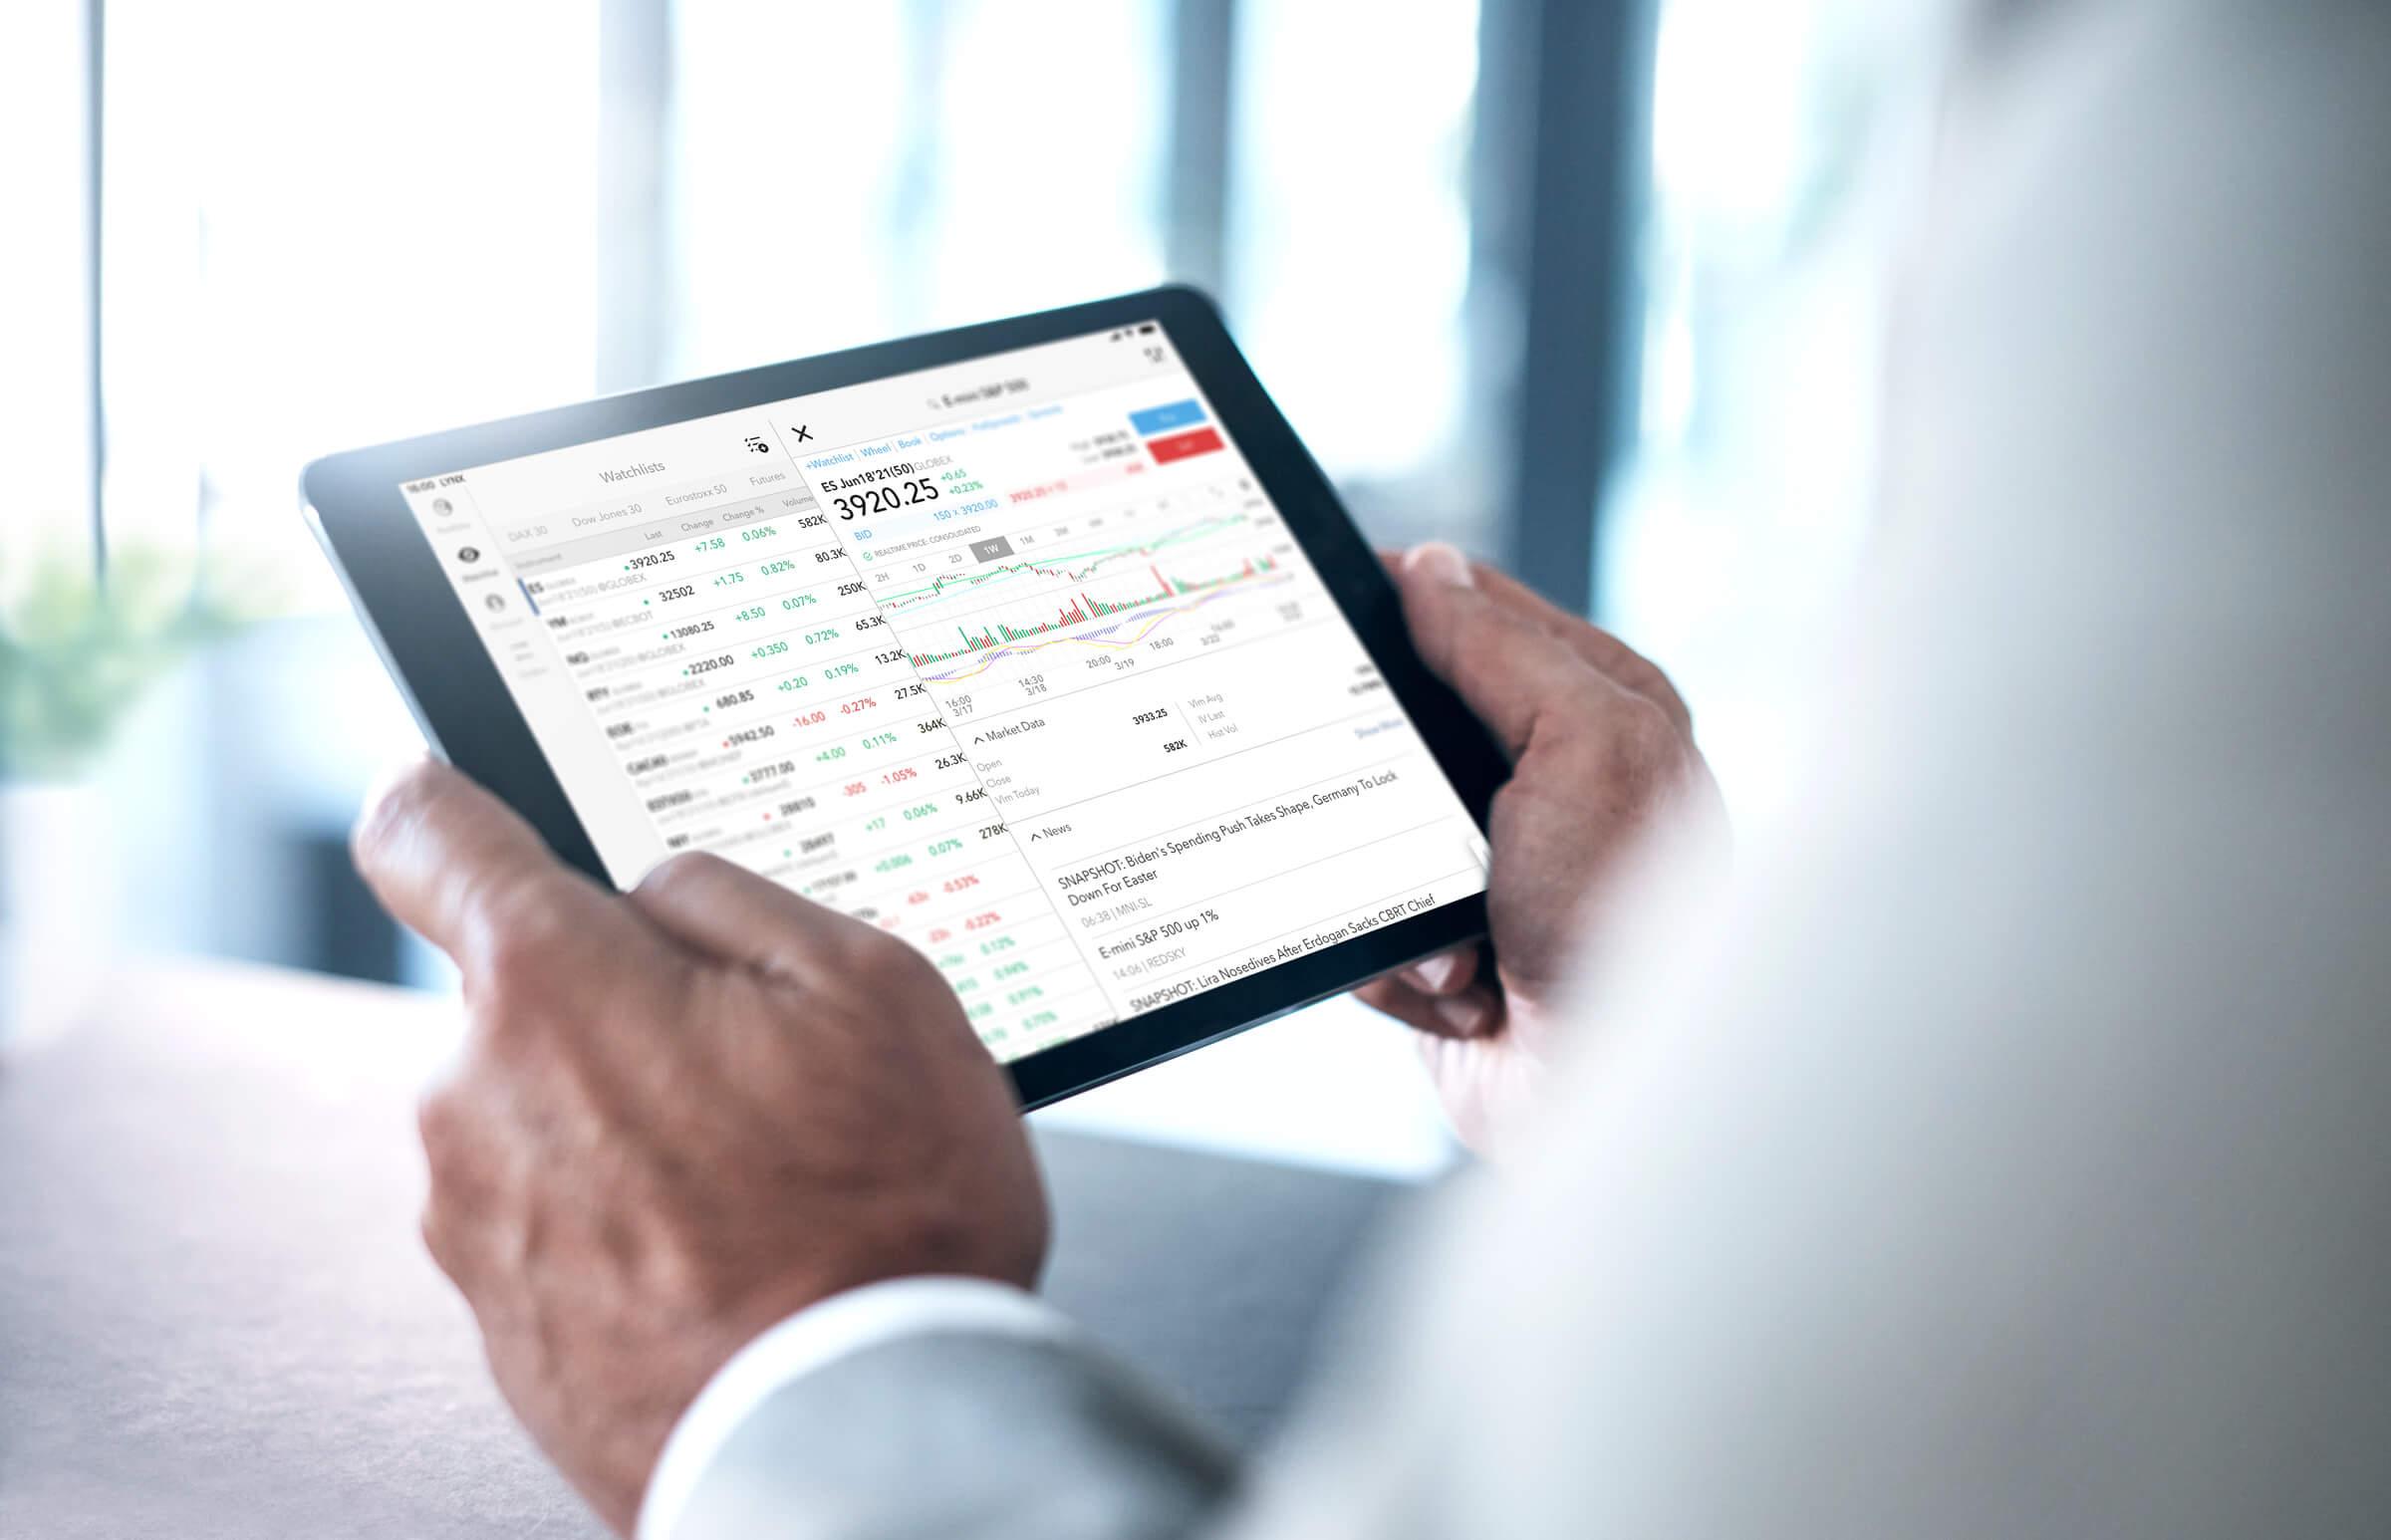 Investor obchodující akcie na krátko (short selling) v iPad aplikaci LYNX Trading